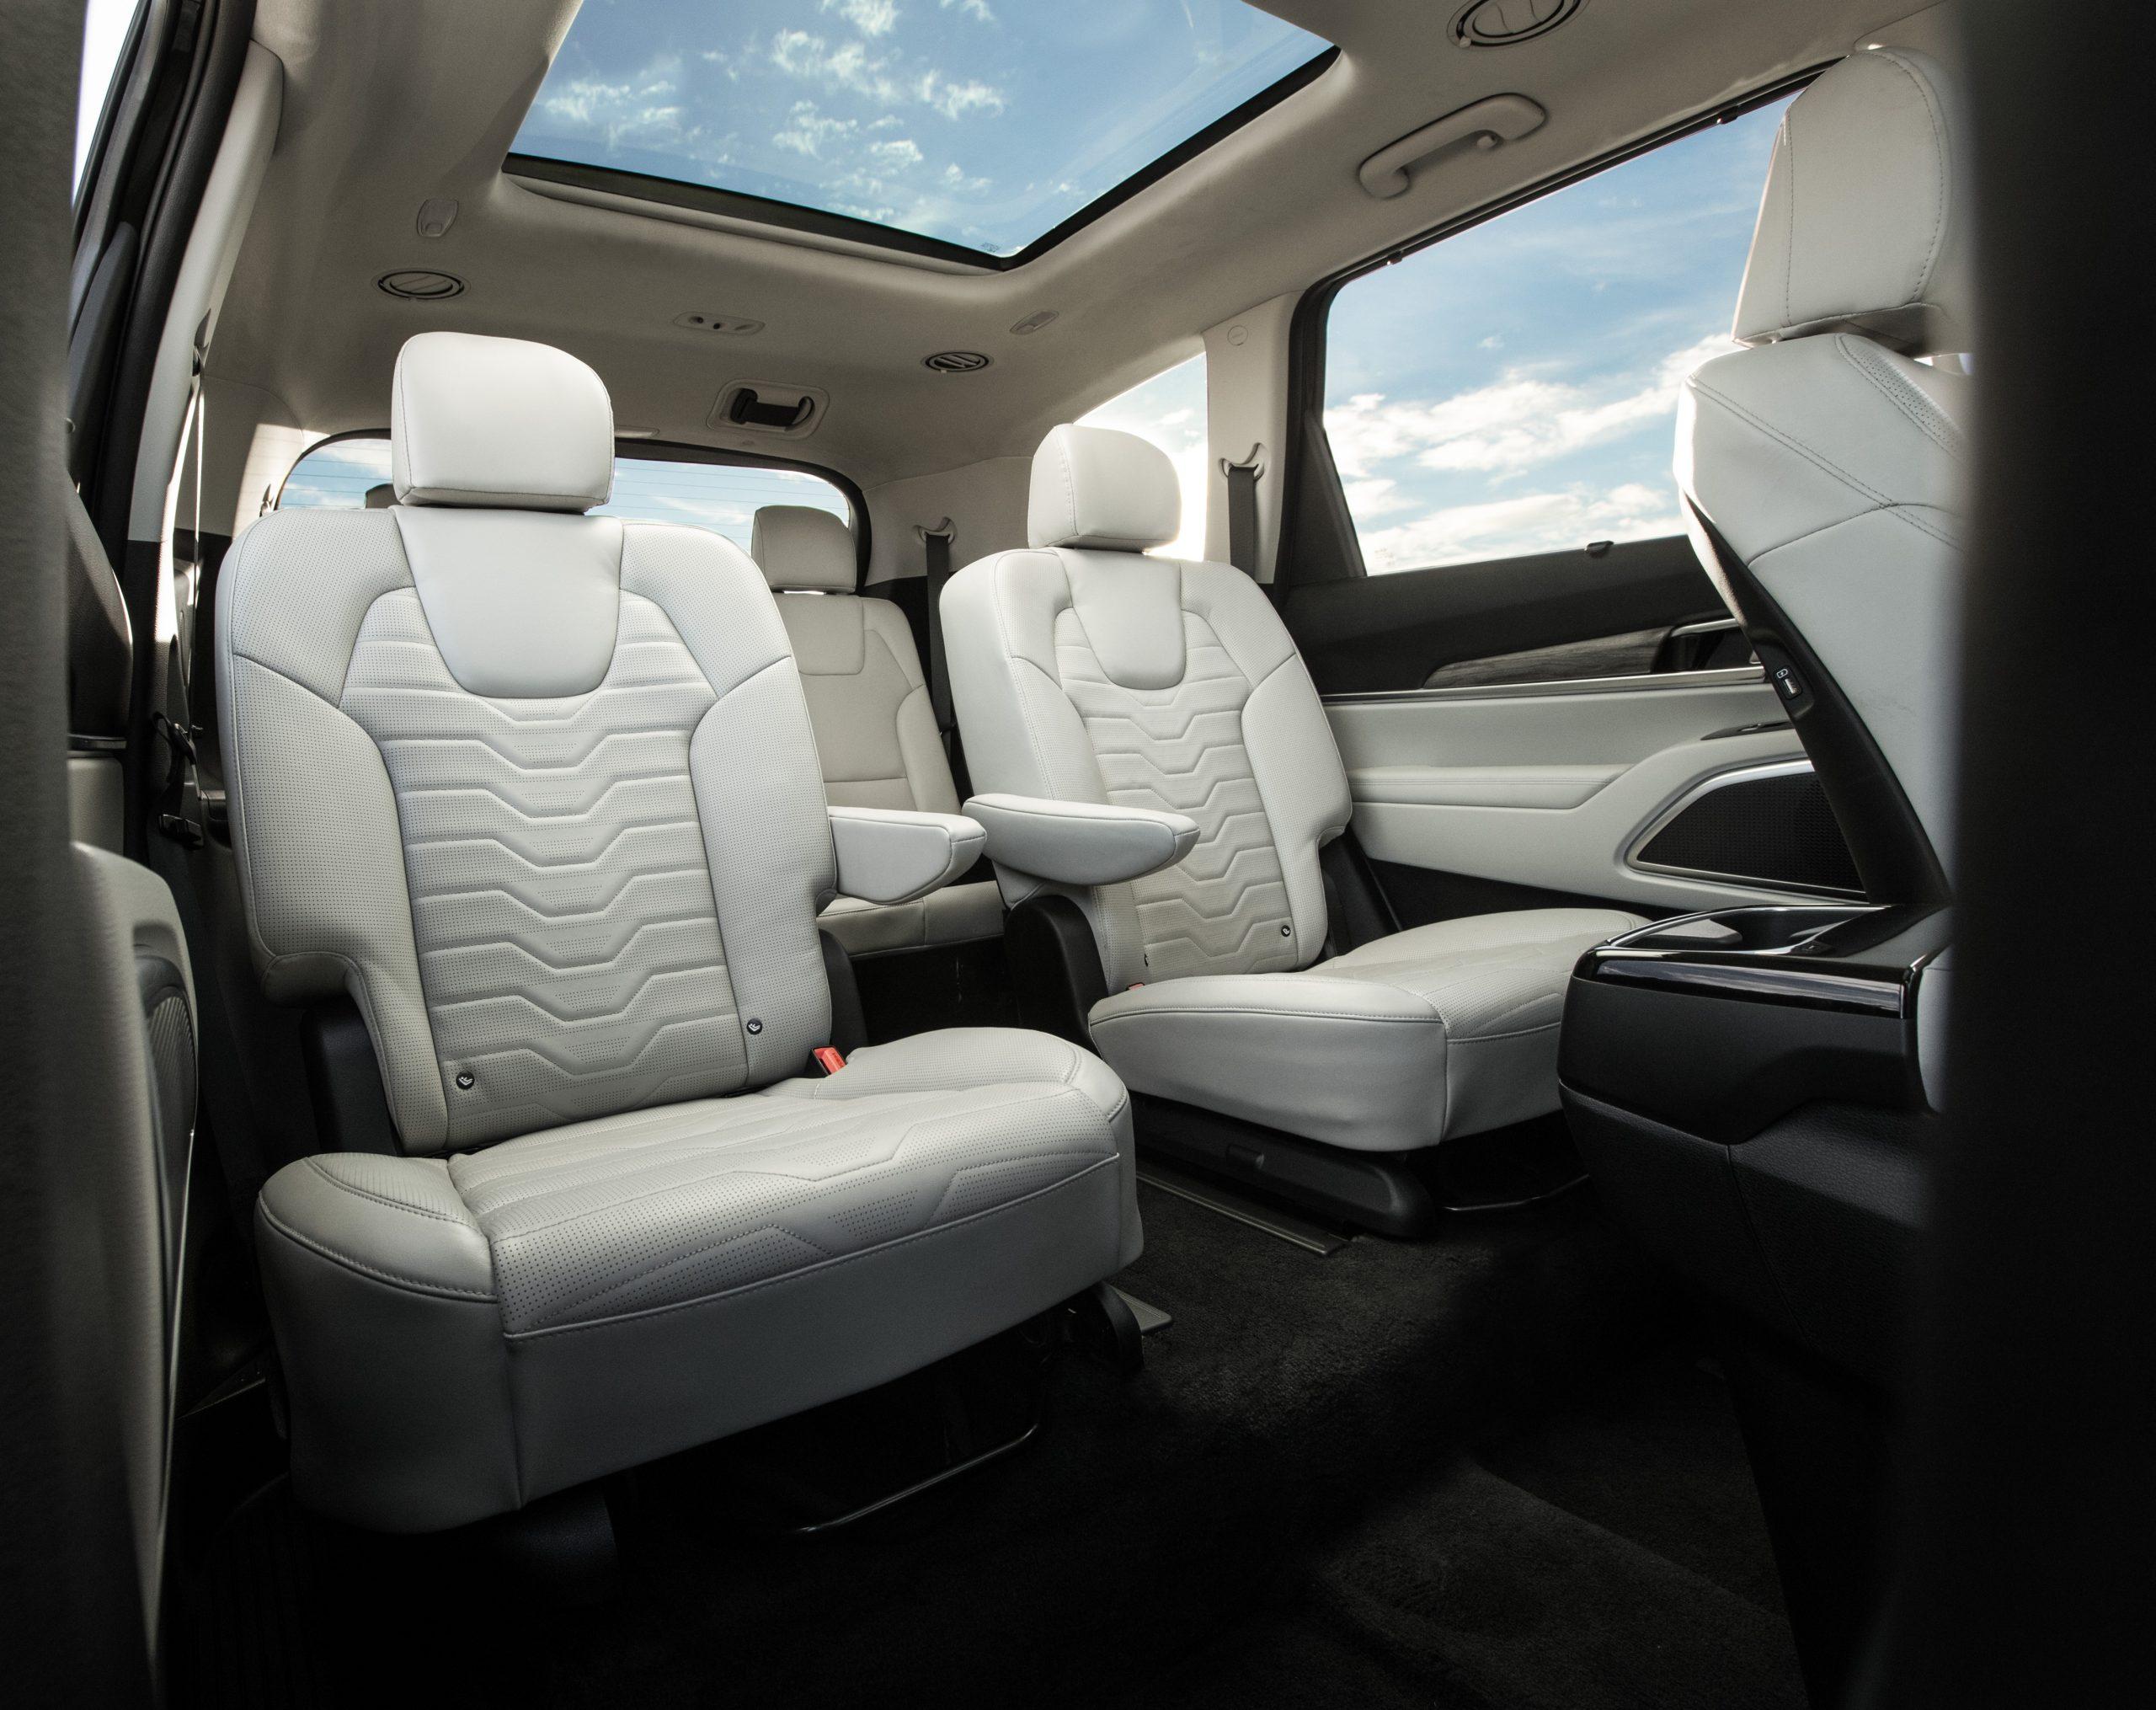 2020 Kia Telluride rear seats